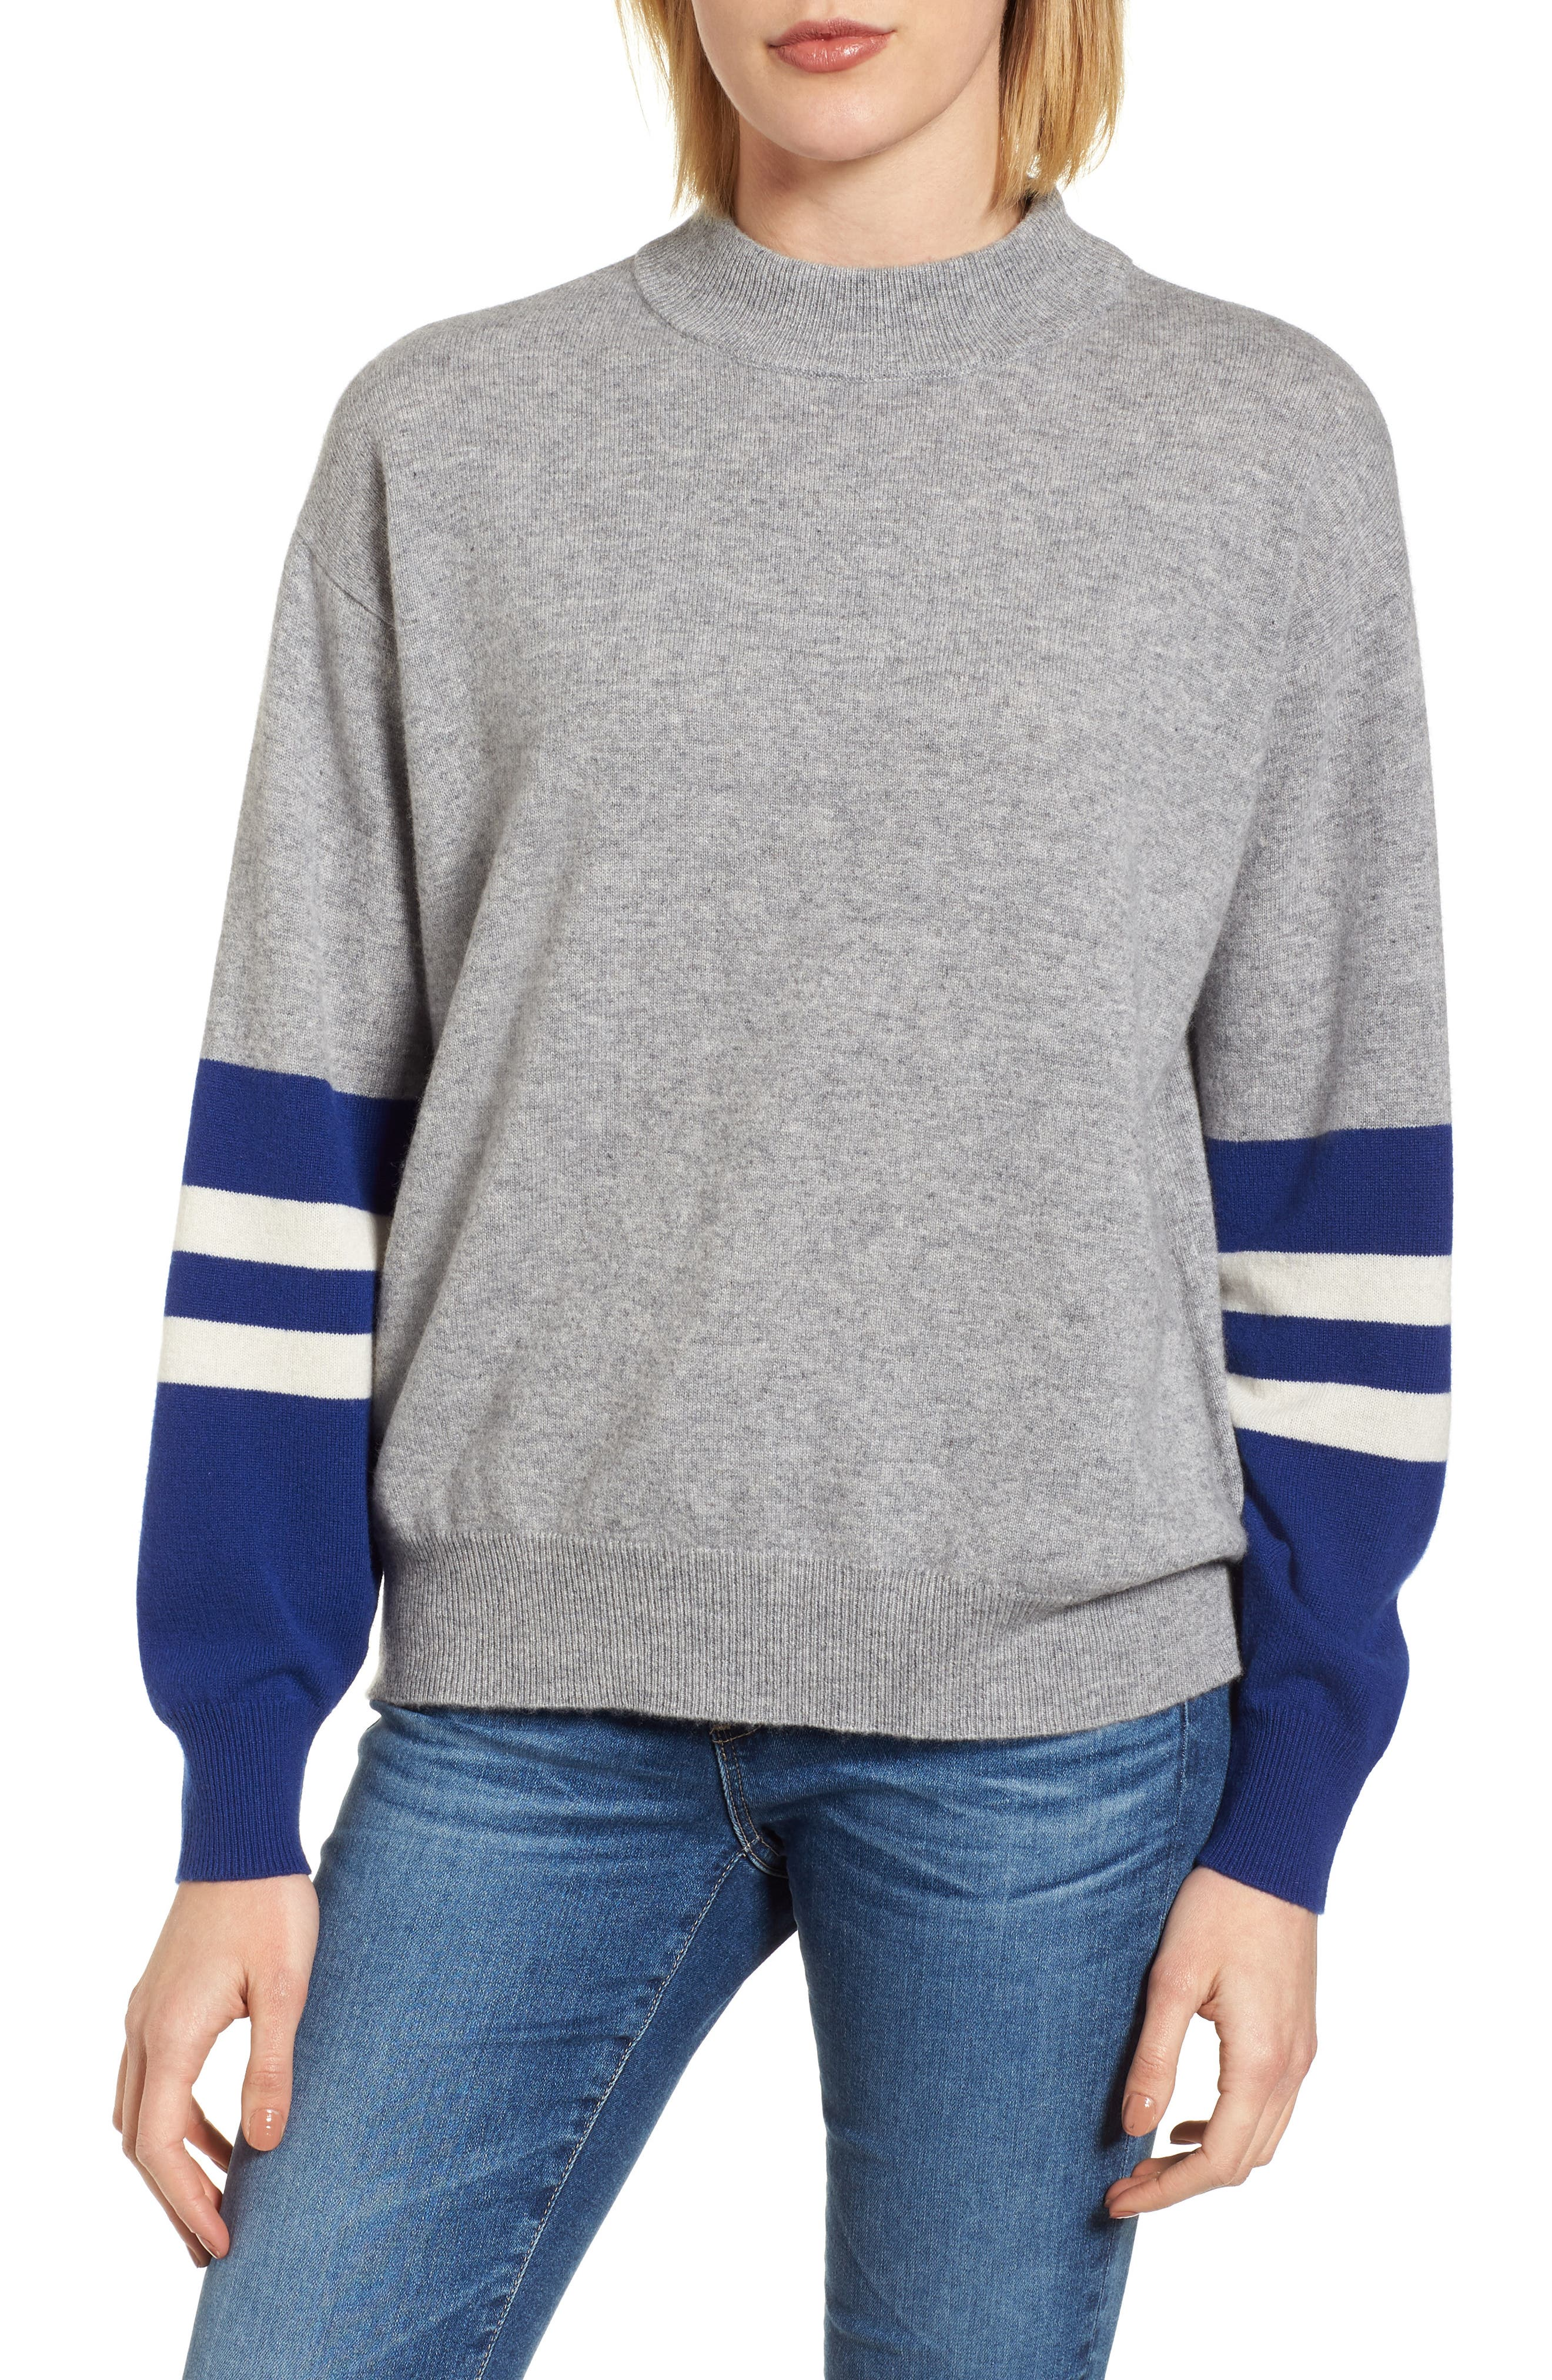 Velvet by Graham & Spencer Colorblock Cashmere Sweater